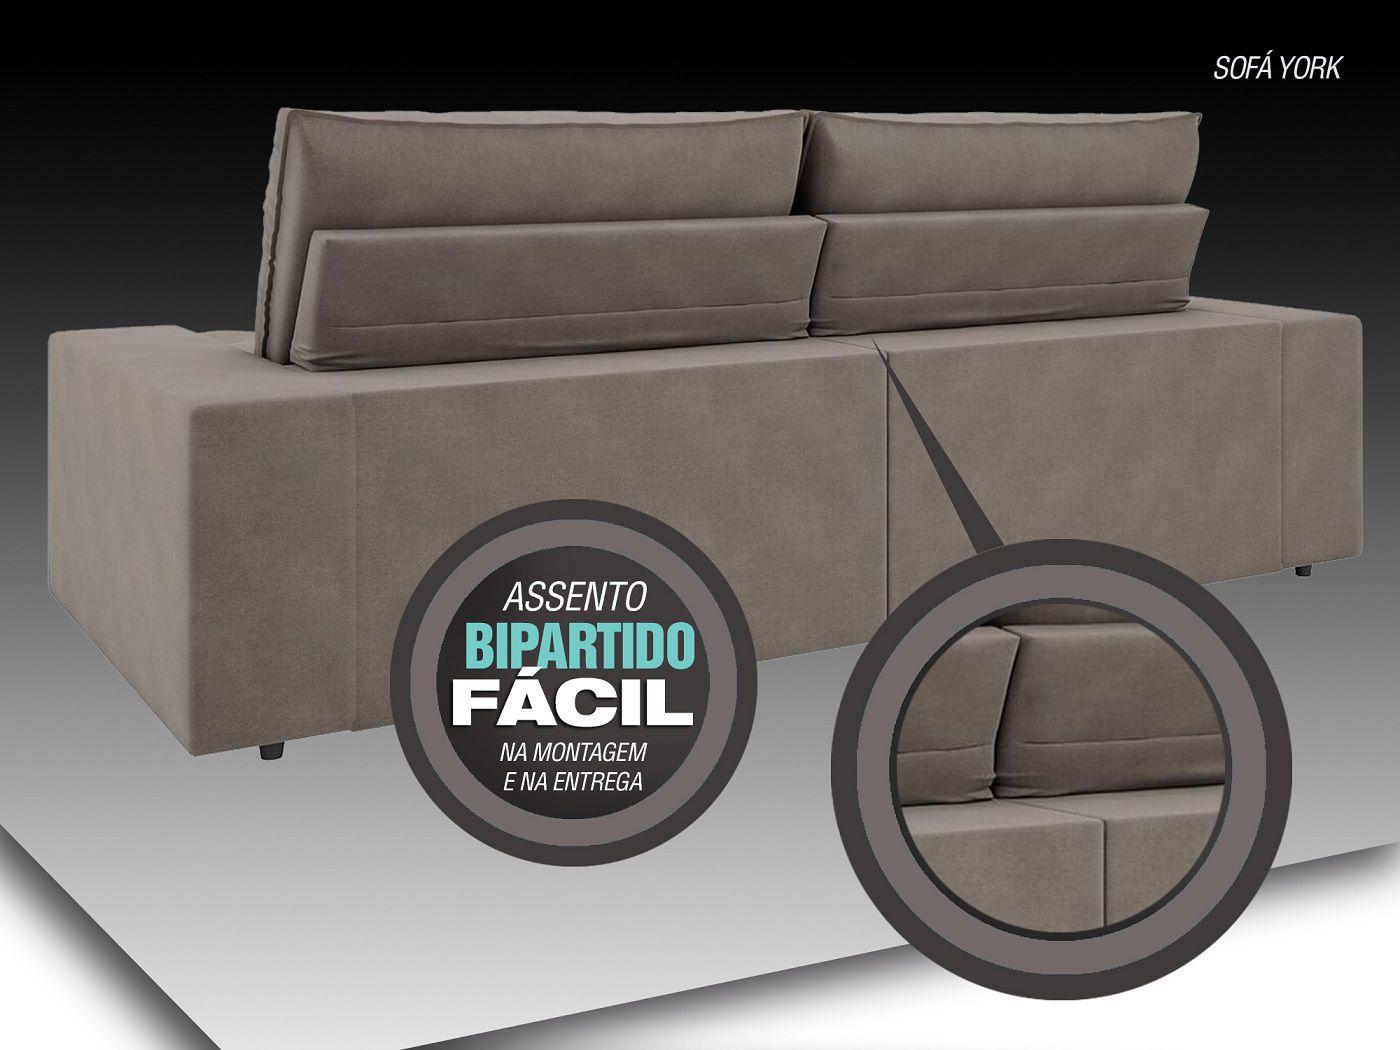 Sofá York 2,10m Assento Retrátil e Reclinável Velosuede Cinza - NETSOFAS